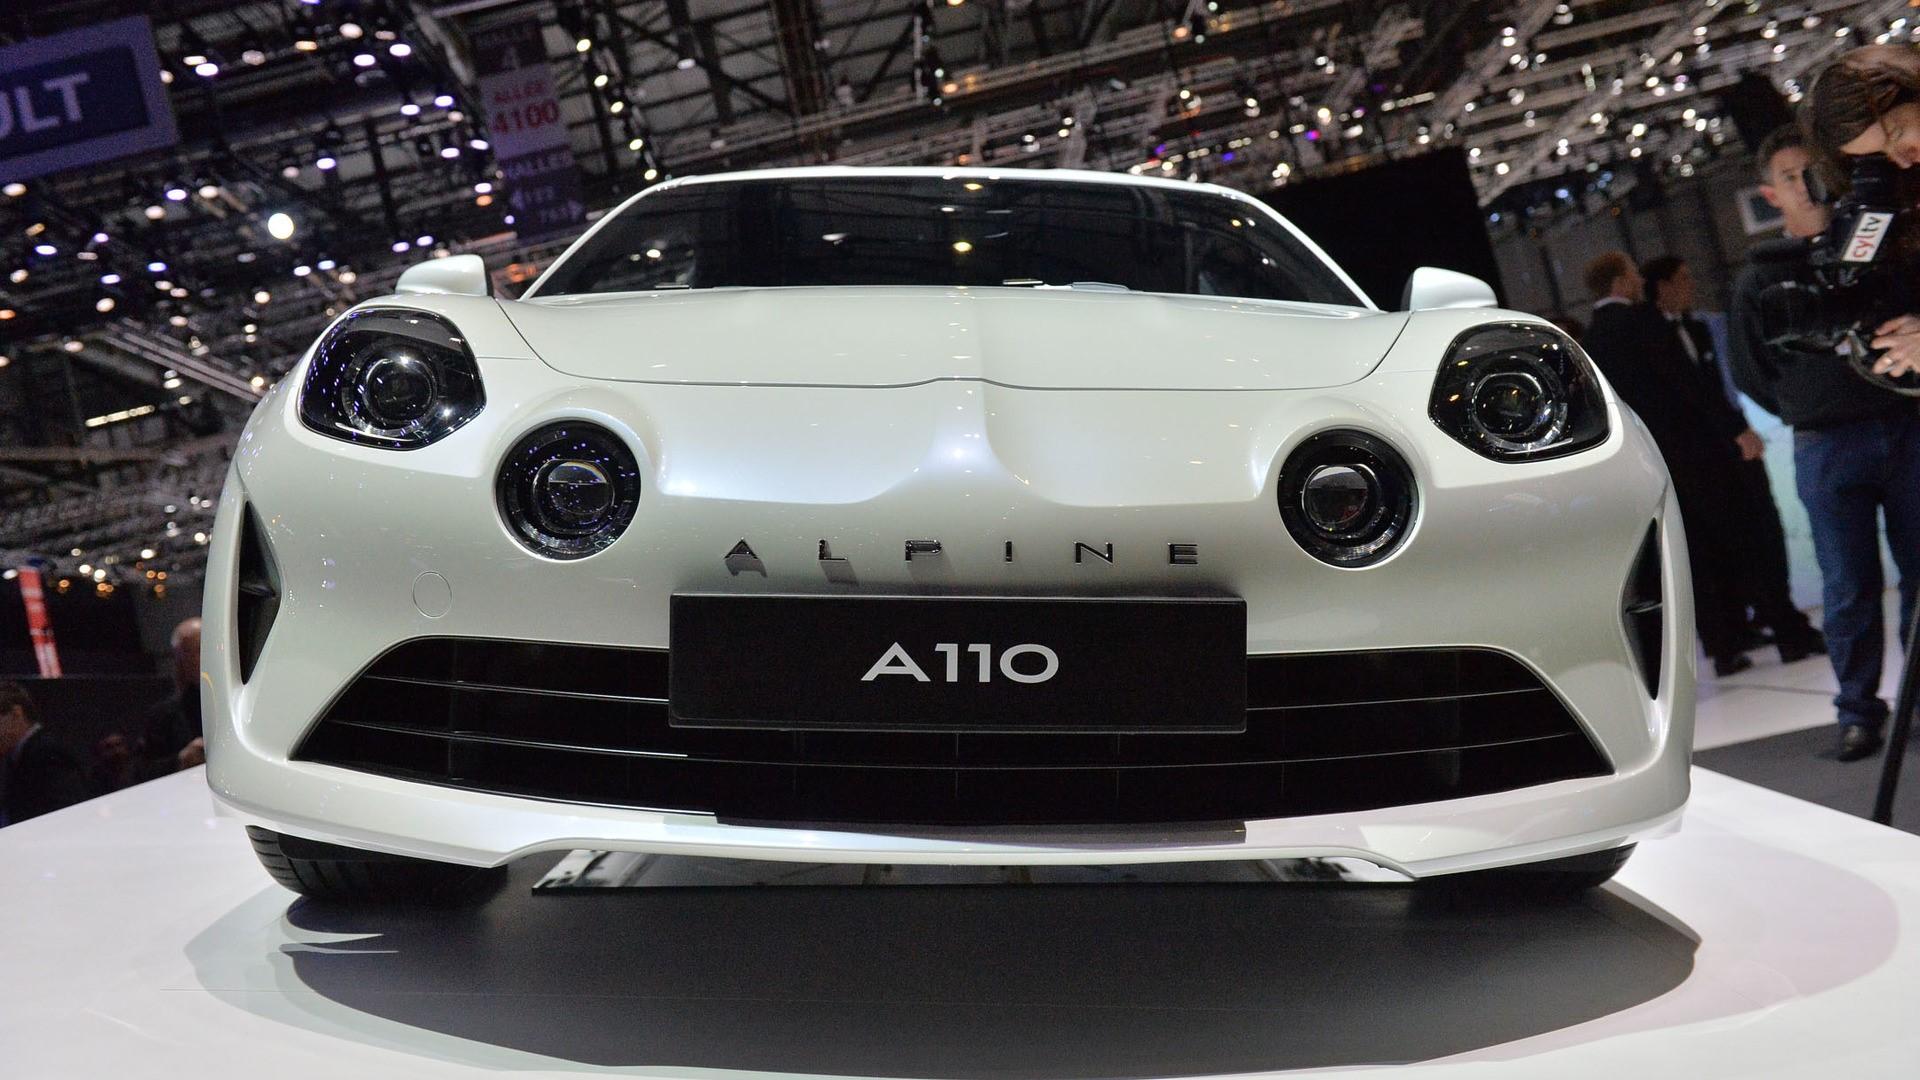 Alpine a110 (7)